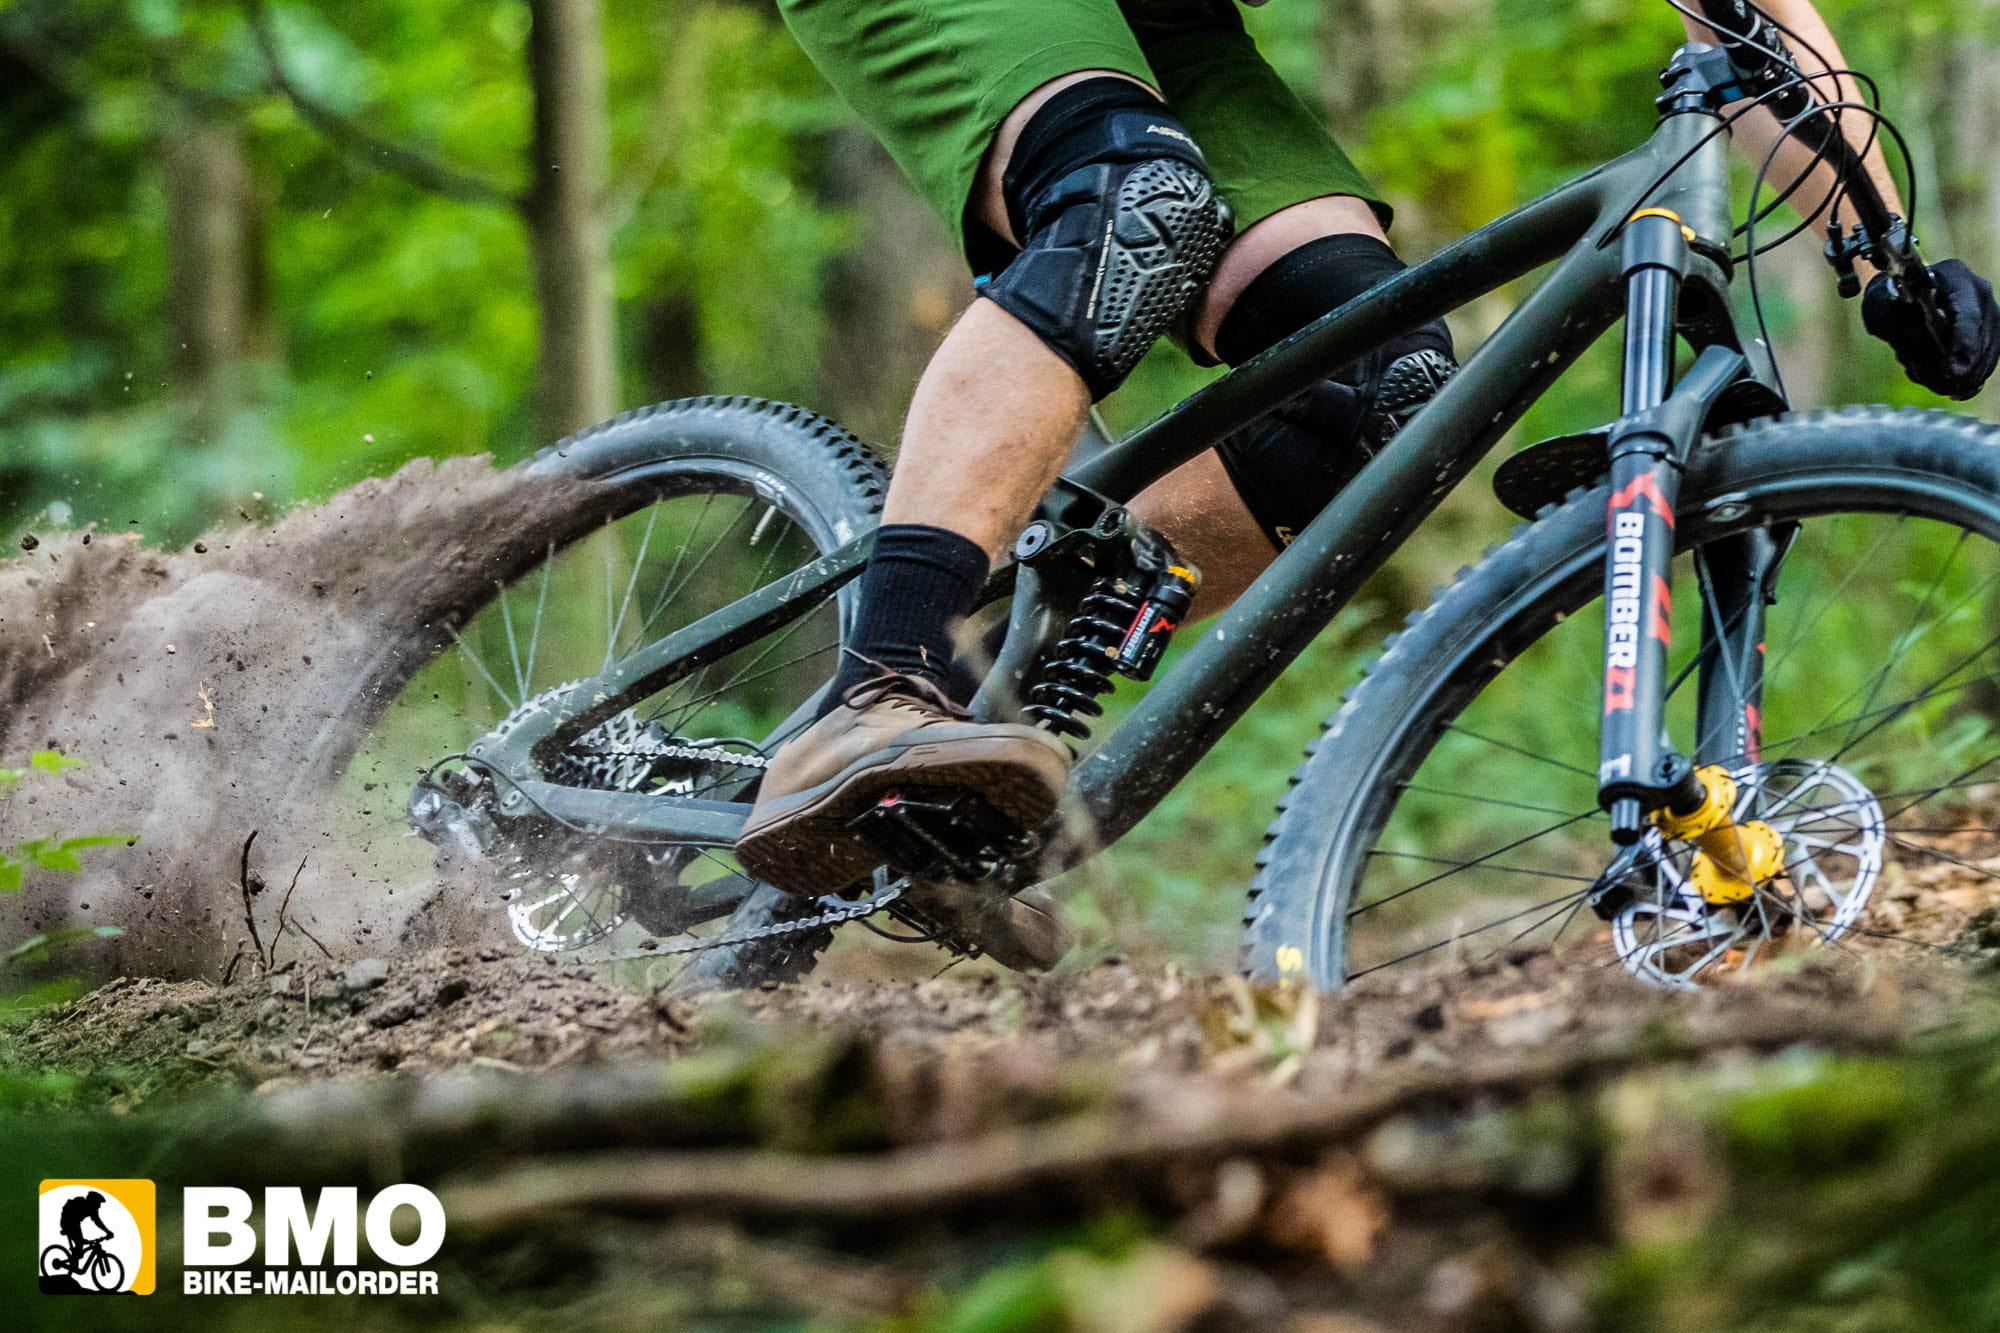 BMO-Bike-Mailorder-Marzocchi-2